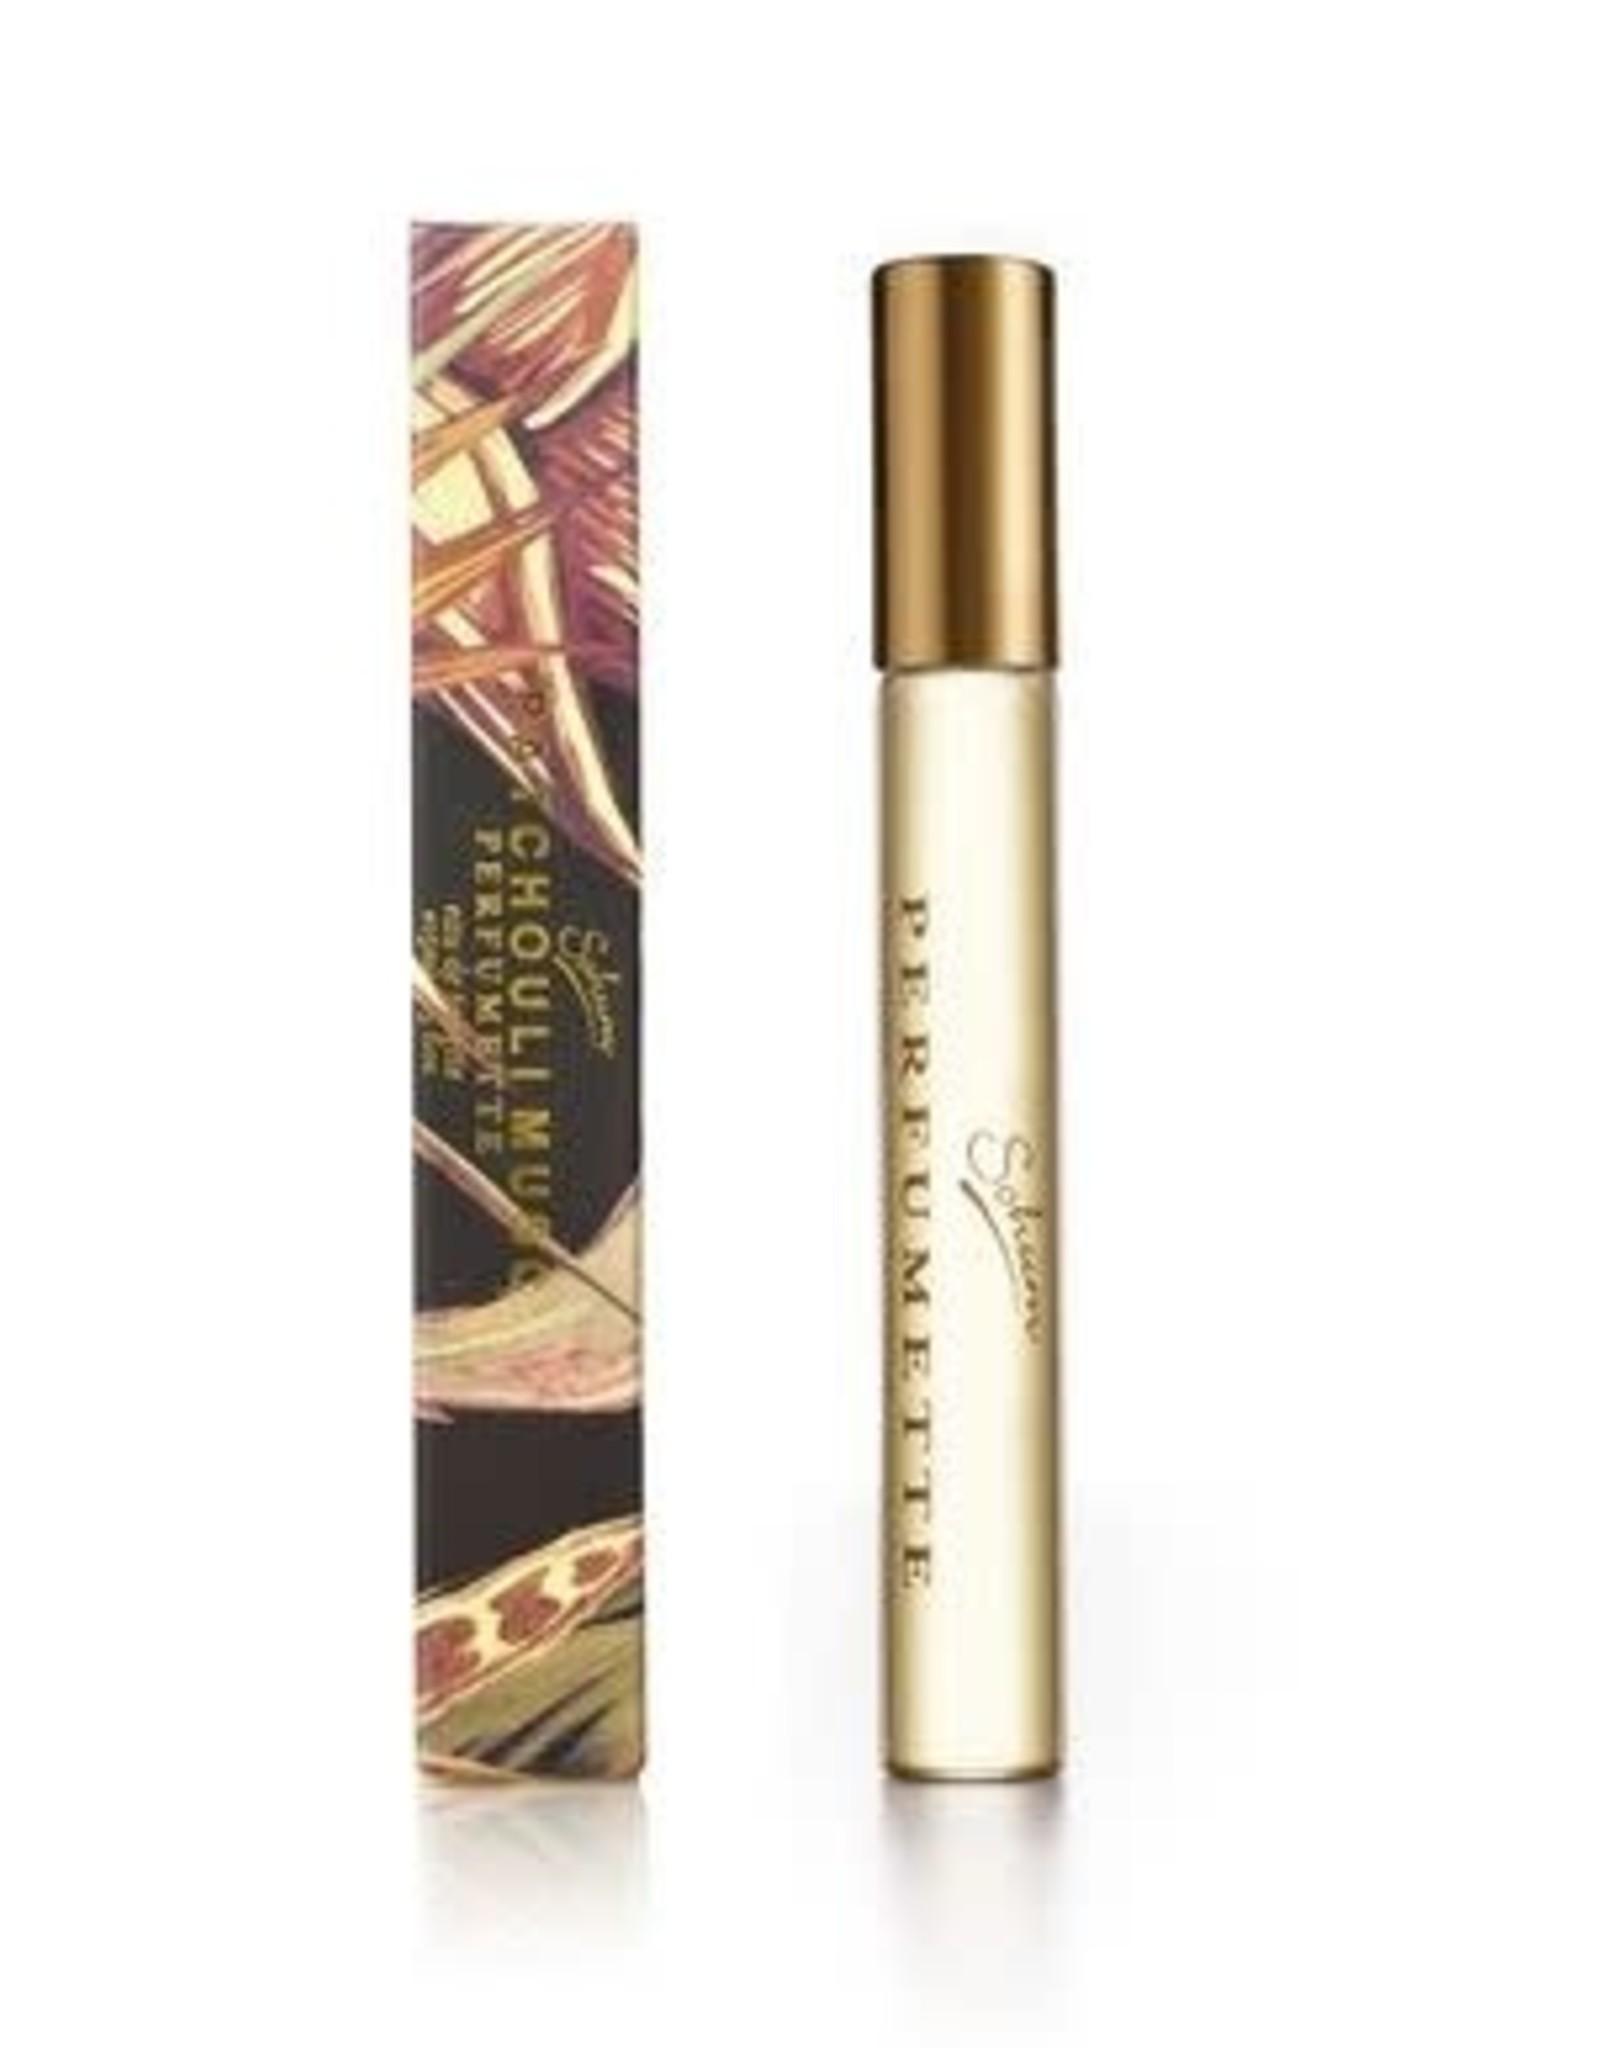 Sohum Boxed Perfumette 15ml